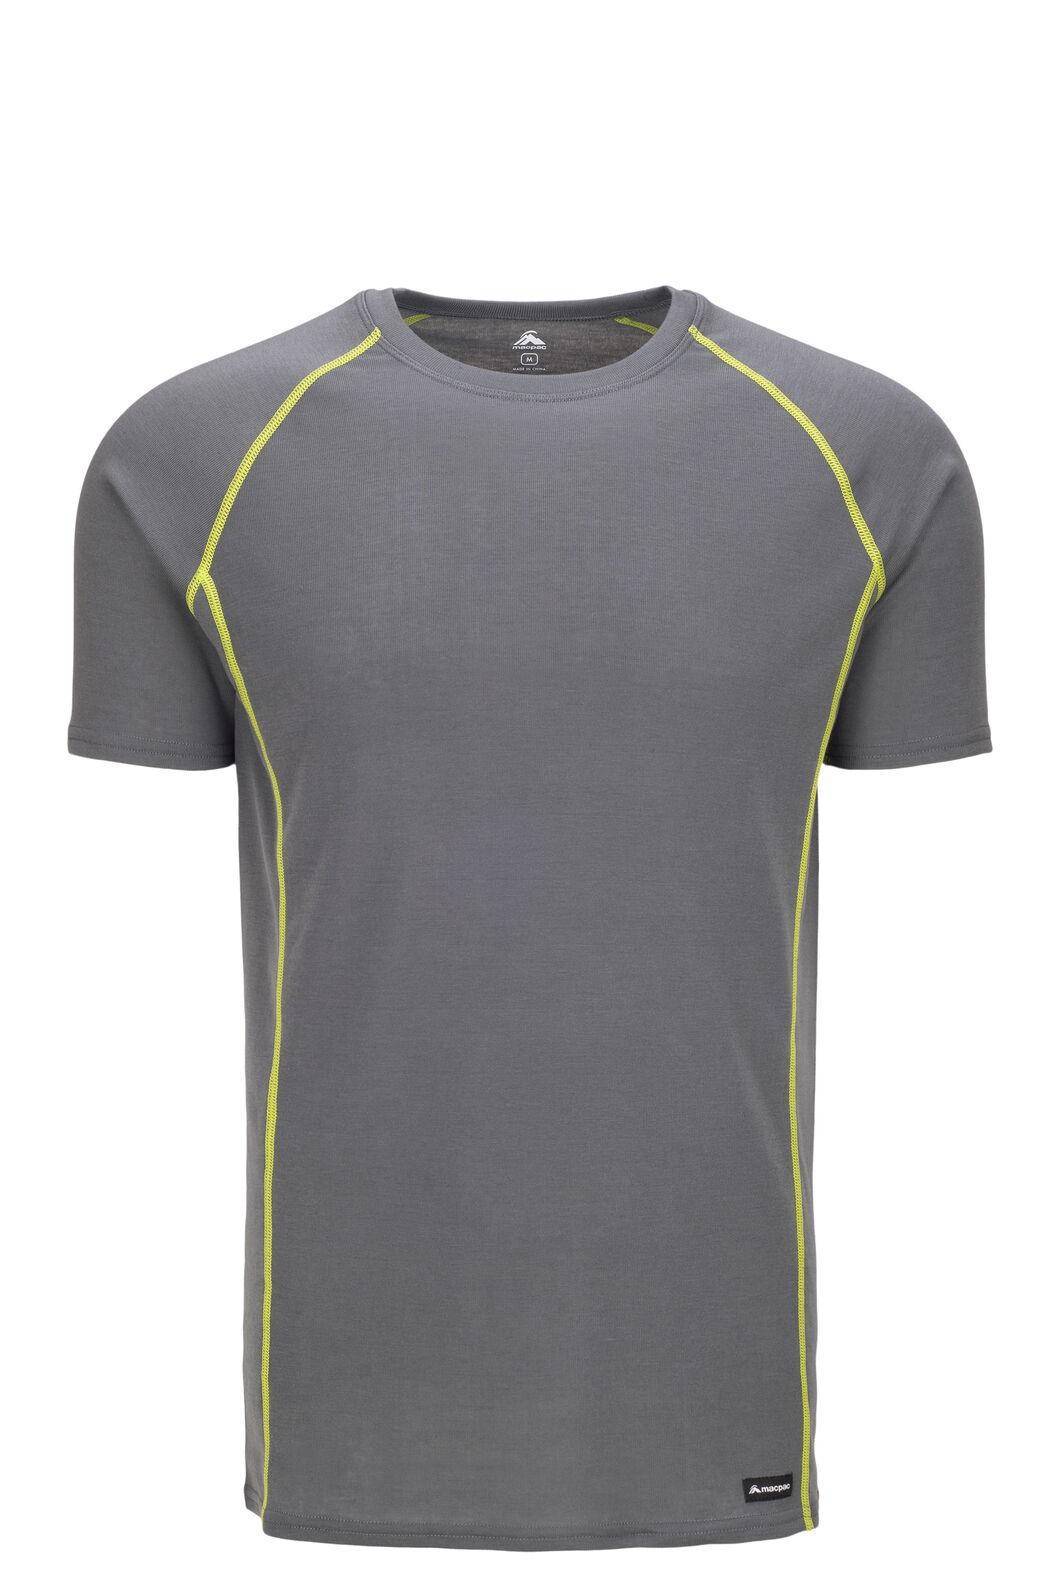 Macpac Geothermal Short Sleeve Top — Men's, Turbulence/Macaw Green, hi-res